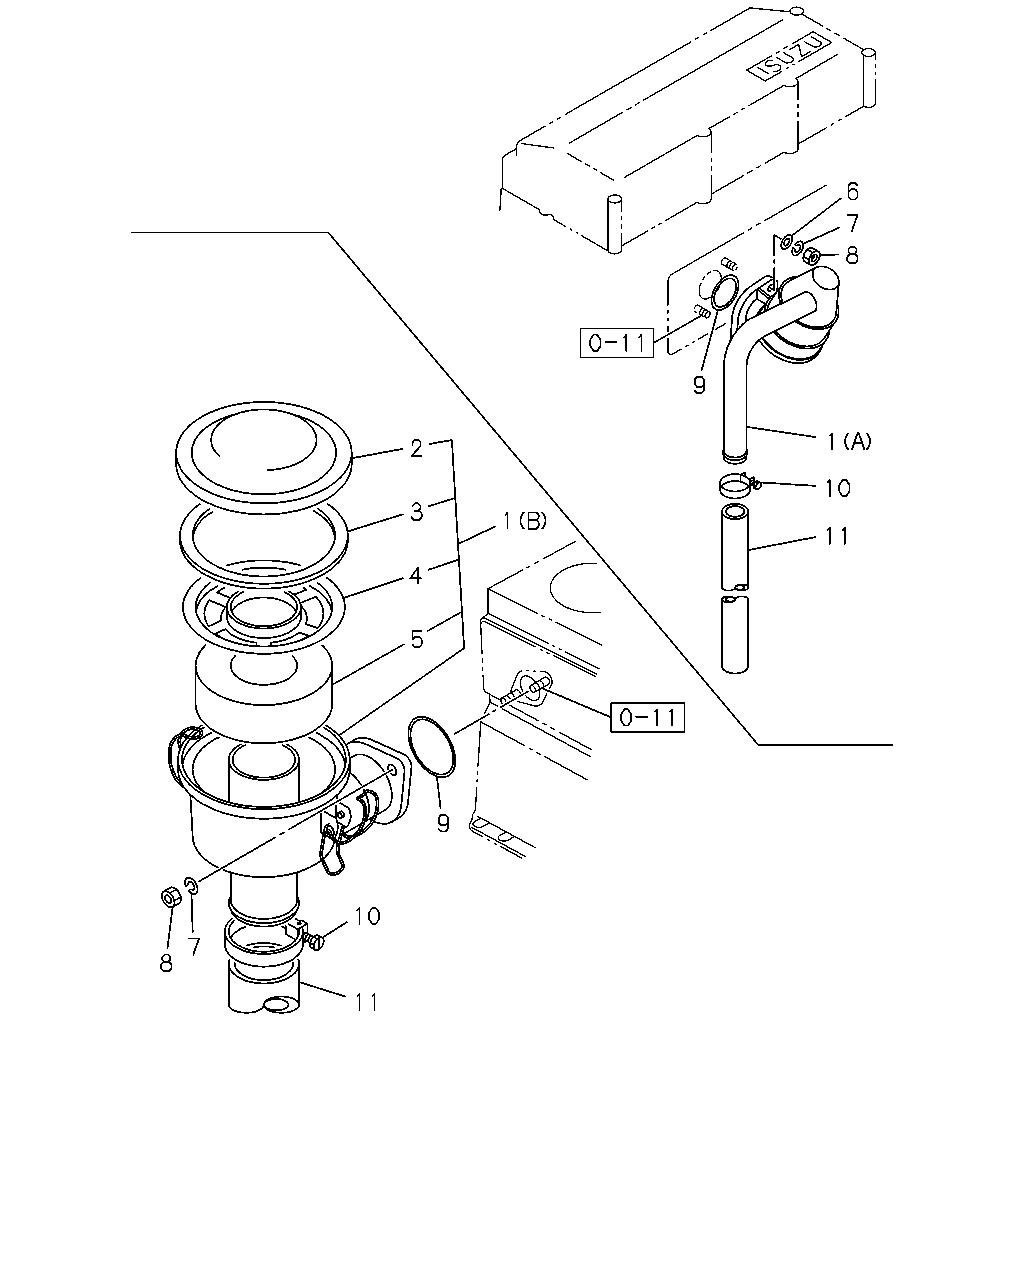 Ce 10648 Chr Cjr Cqr 90 99 0 Engine Emission L24 Diagram A 6qa1 Std Eng